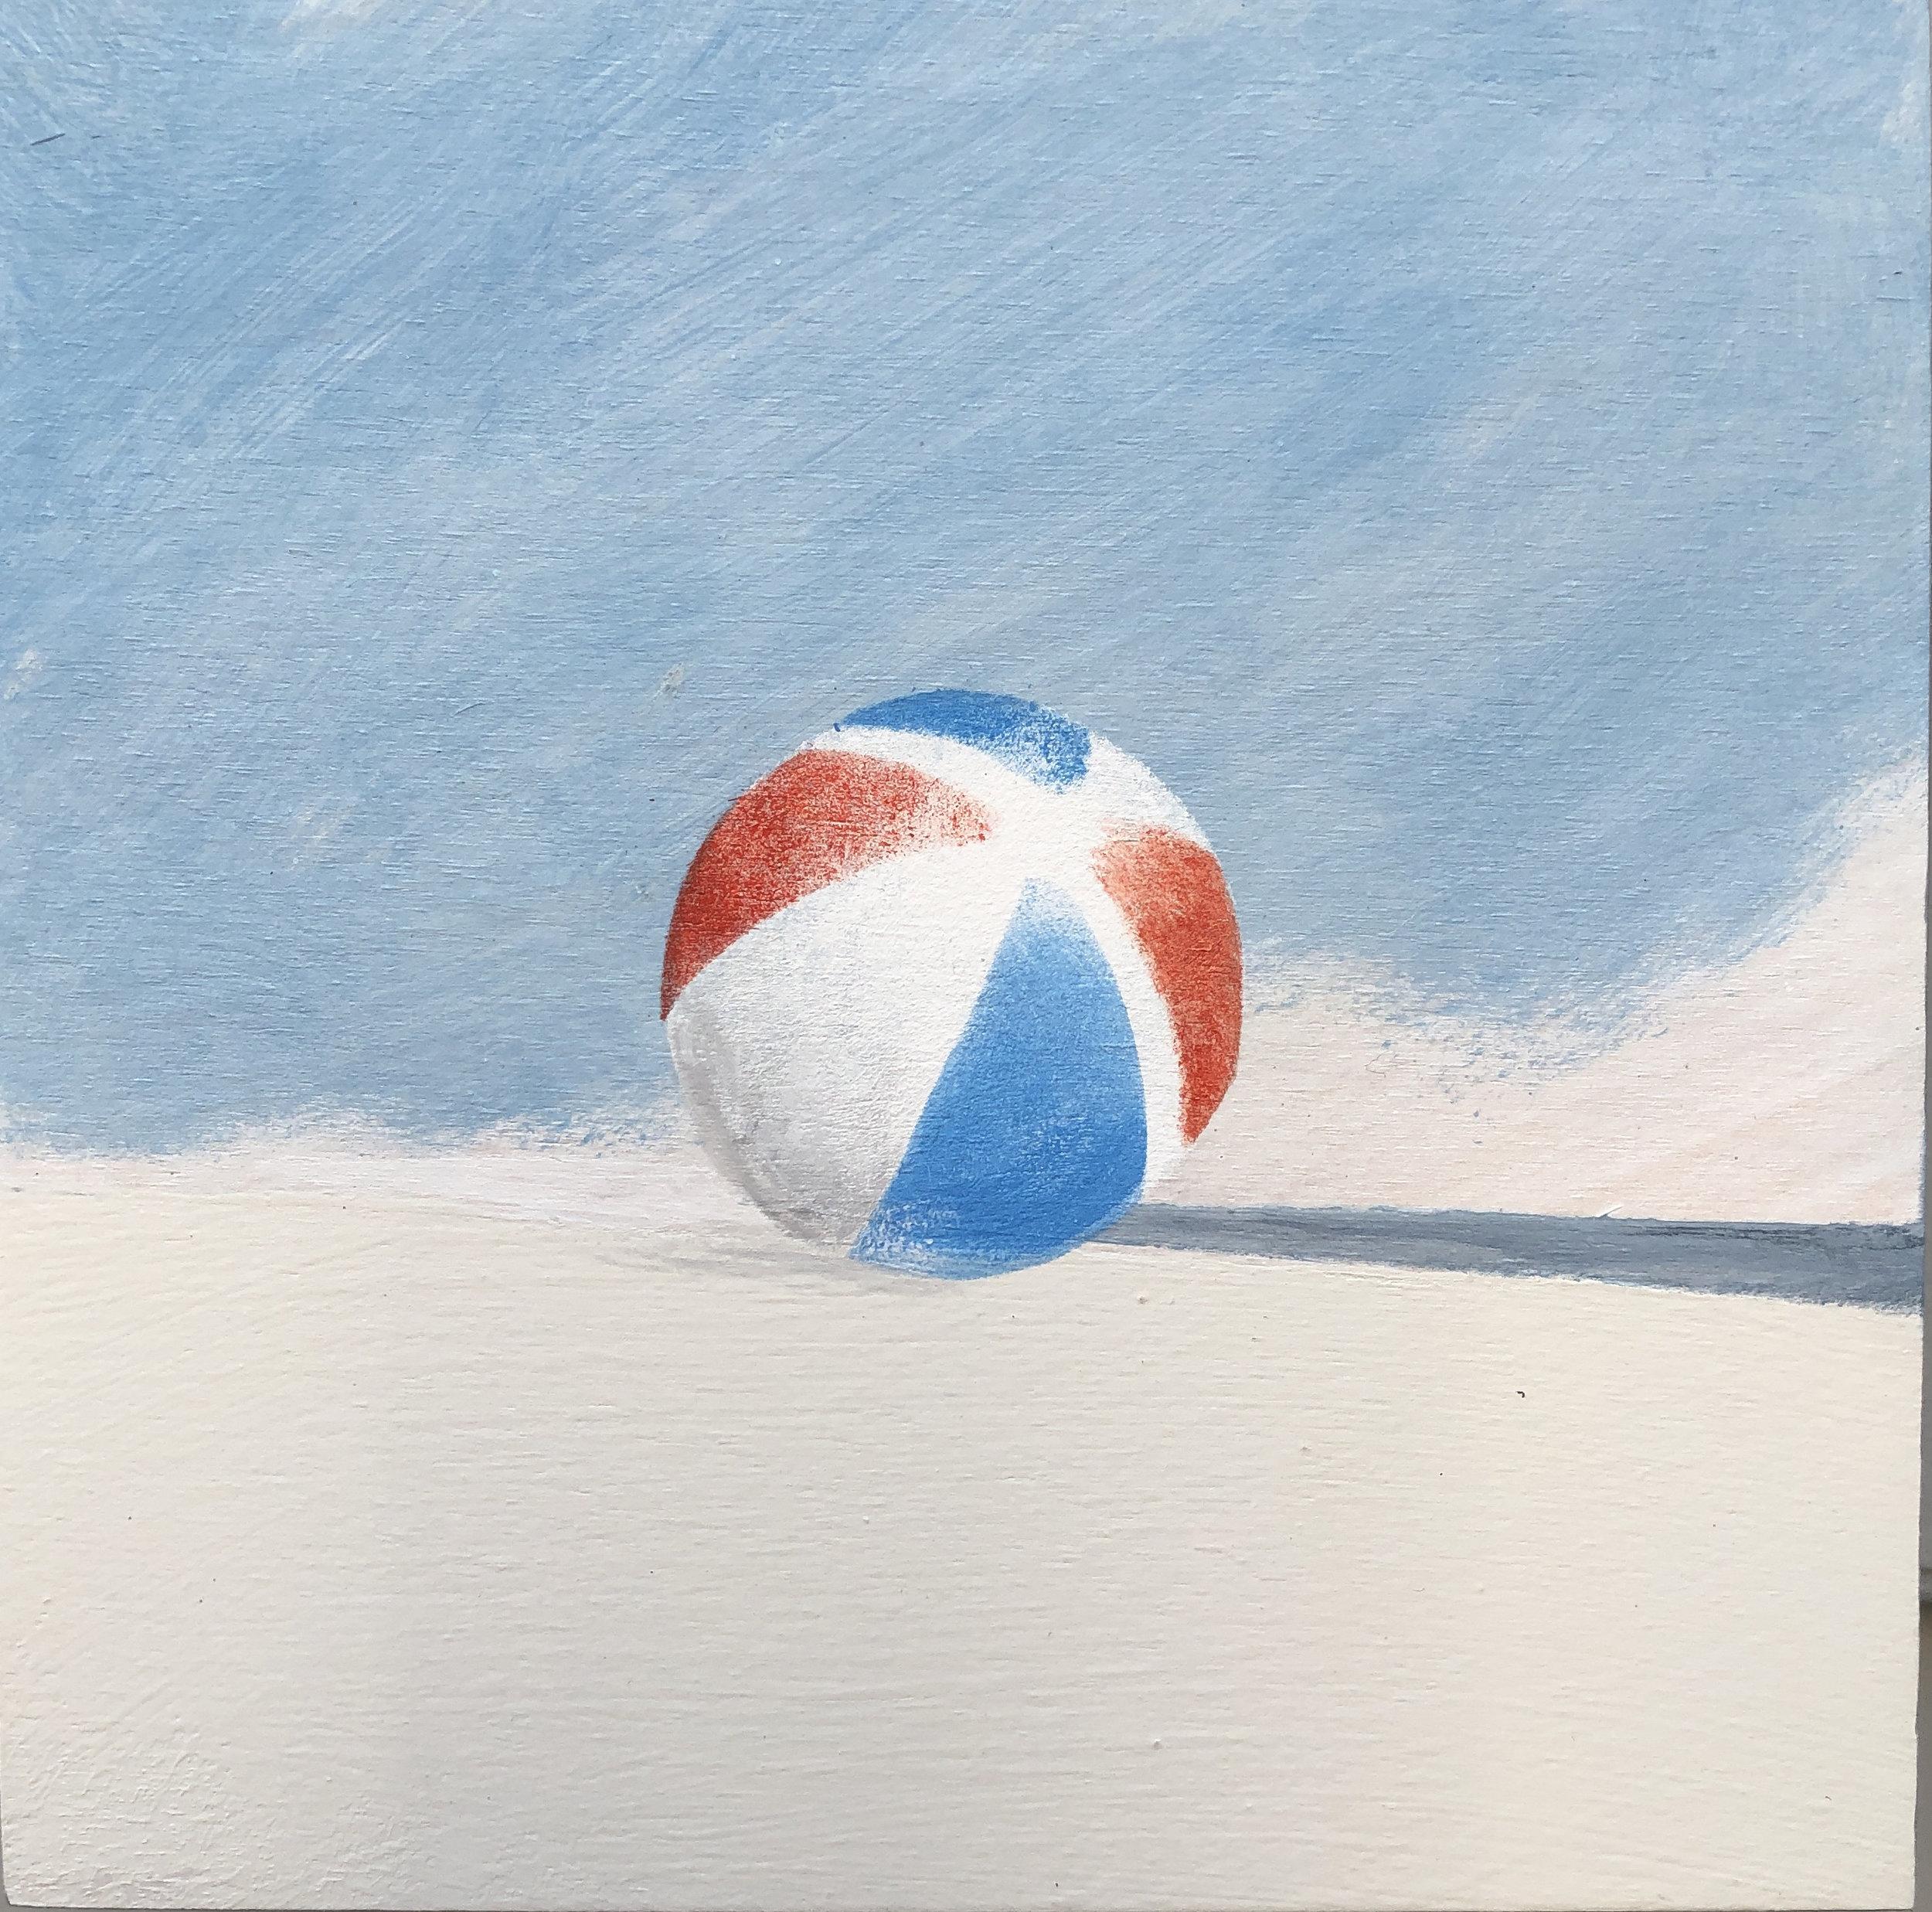 YAY BALL | SOLD